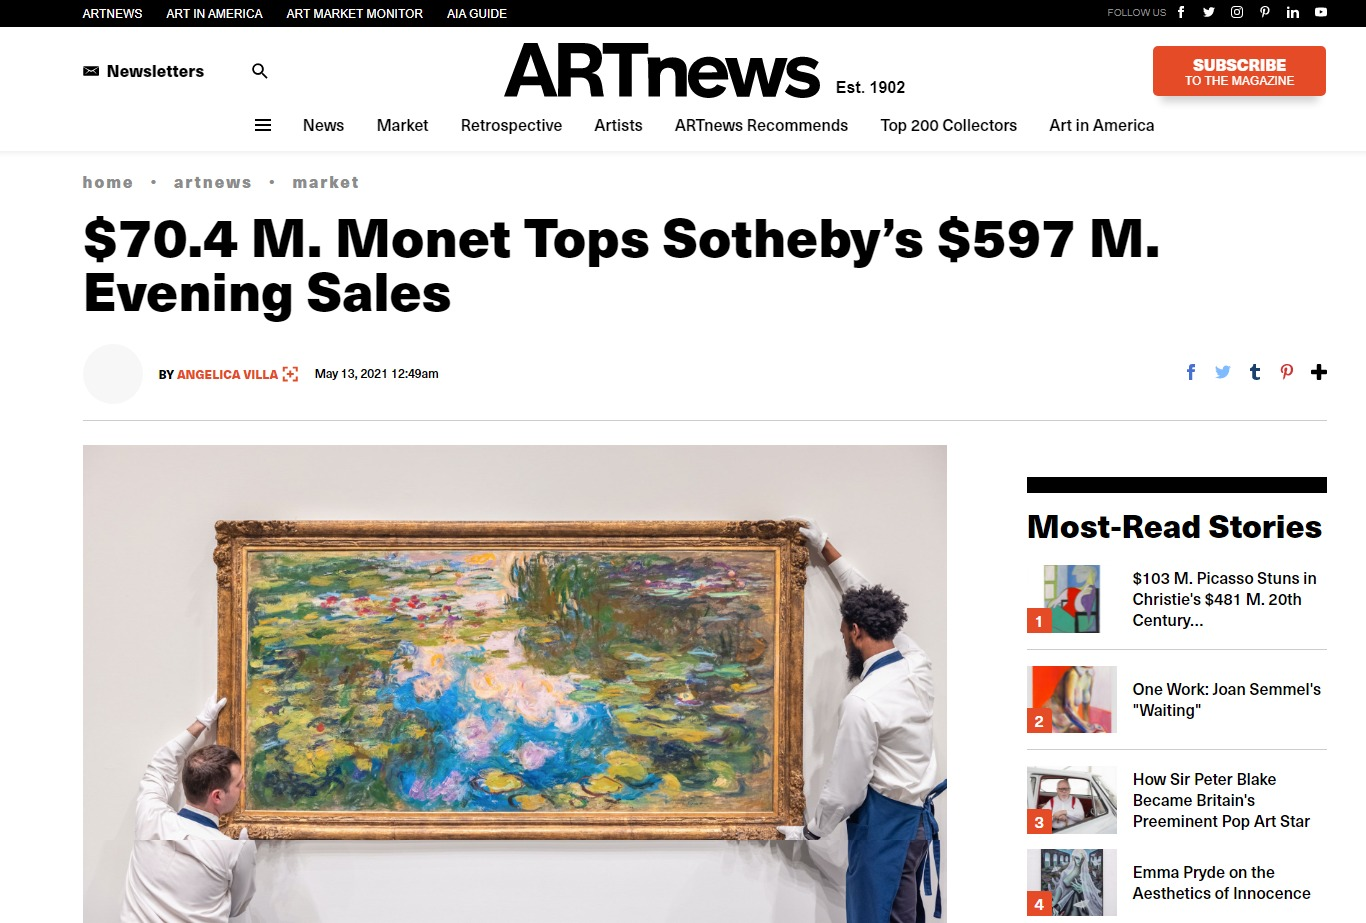 70.4m monet tops sotheby's 597m